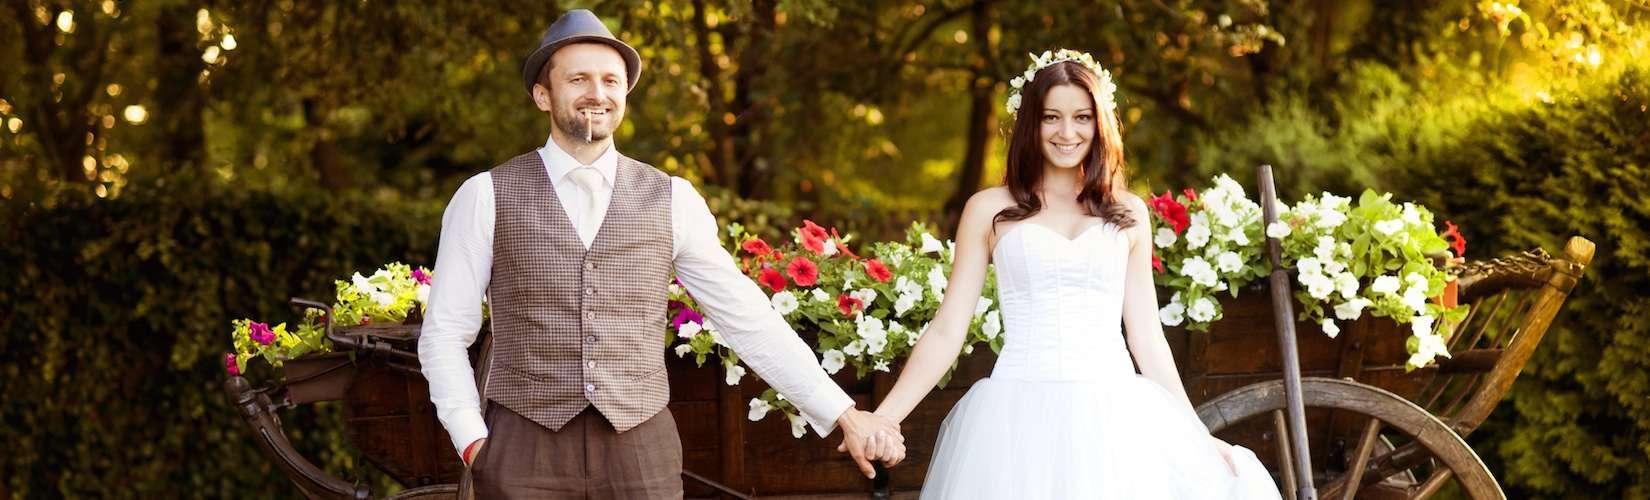 Svatebni Trendy A Vice Nez 20 Inspiraci Pro Rok 2019 Svet Svateb Cz